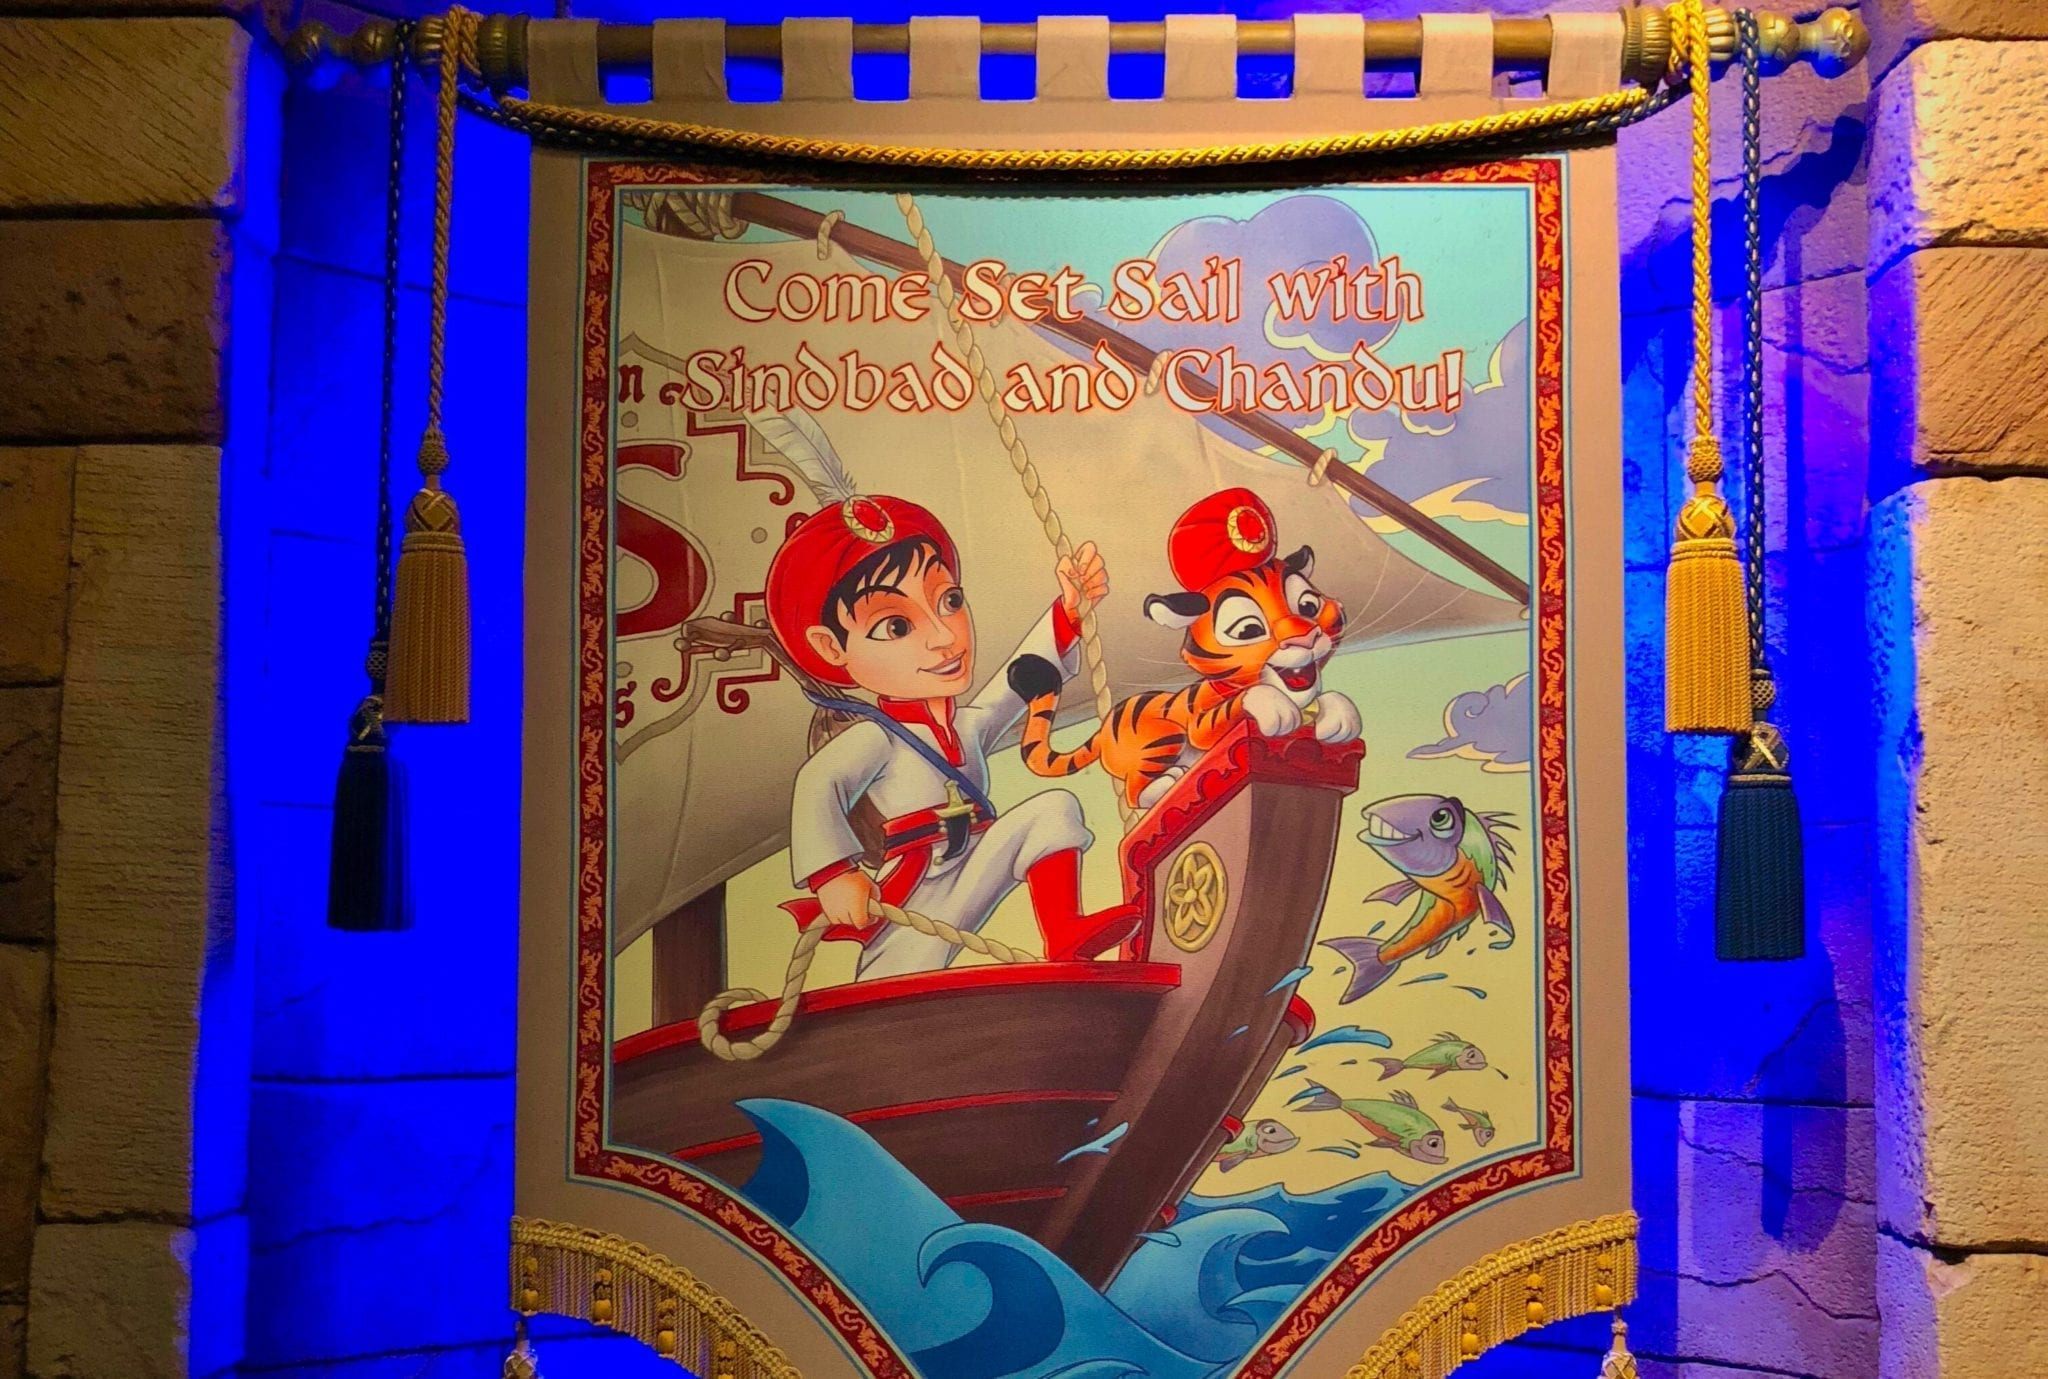 Watch Sindbad's Storybook Voyage at Tokyo DisneySea!